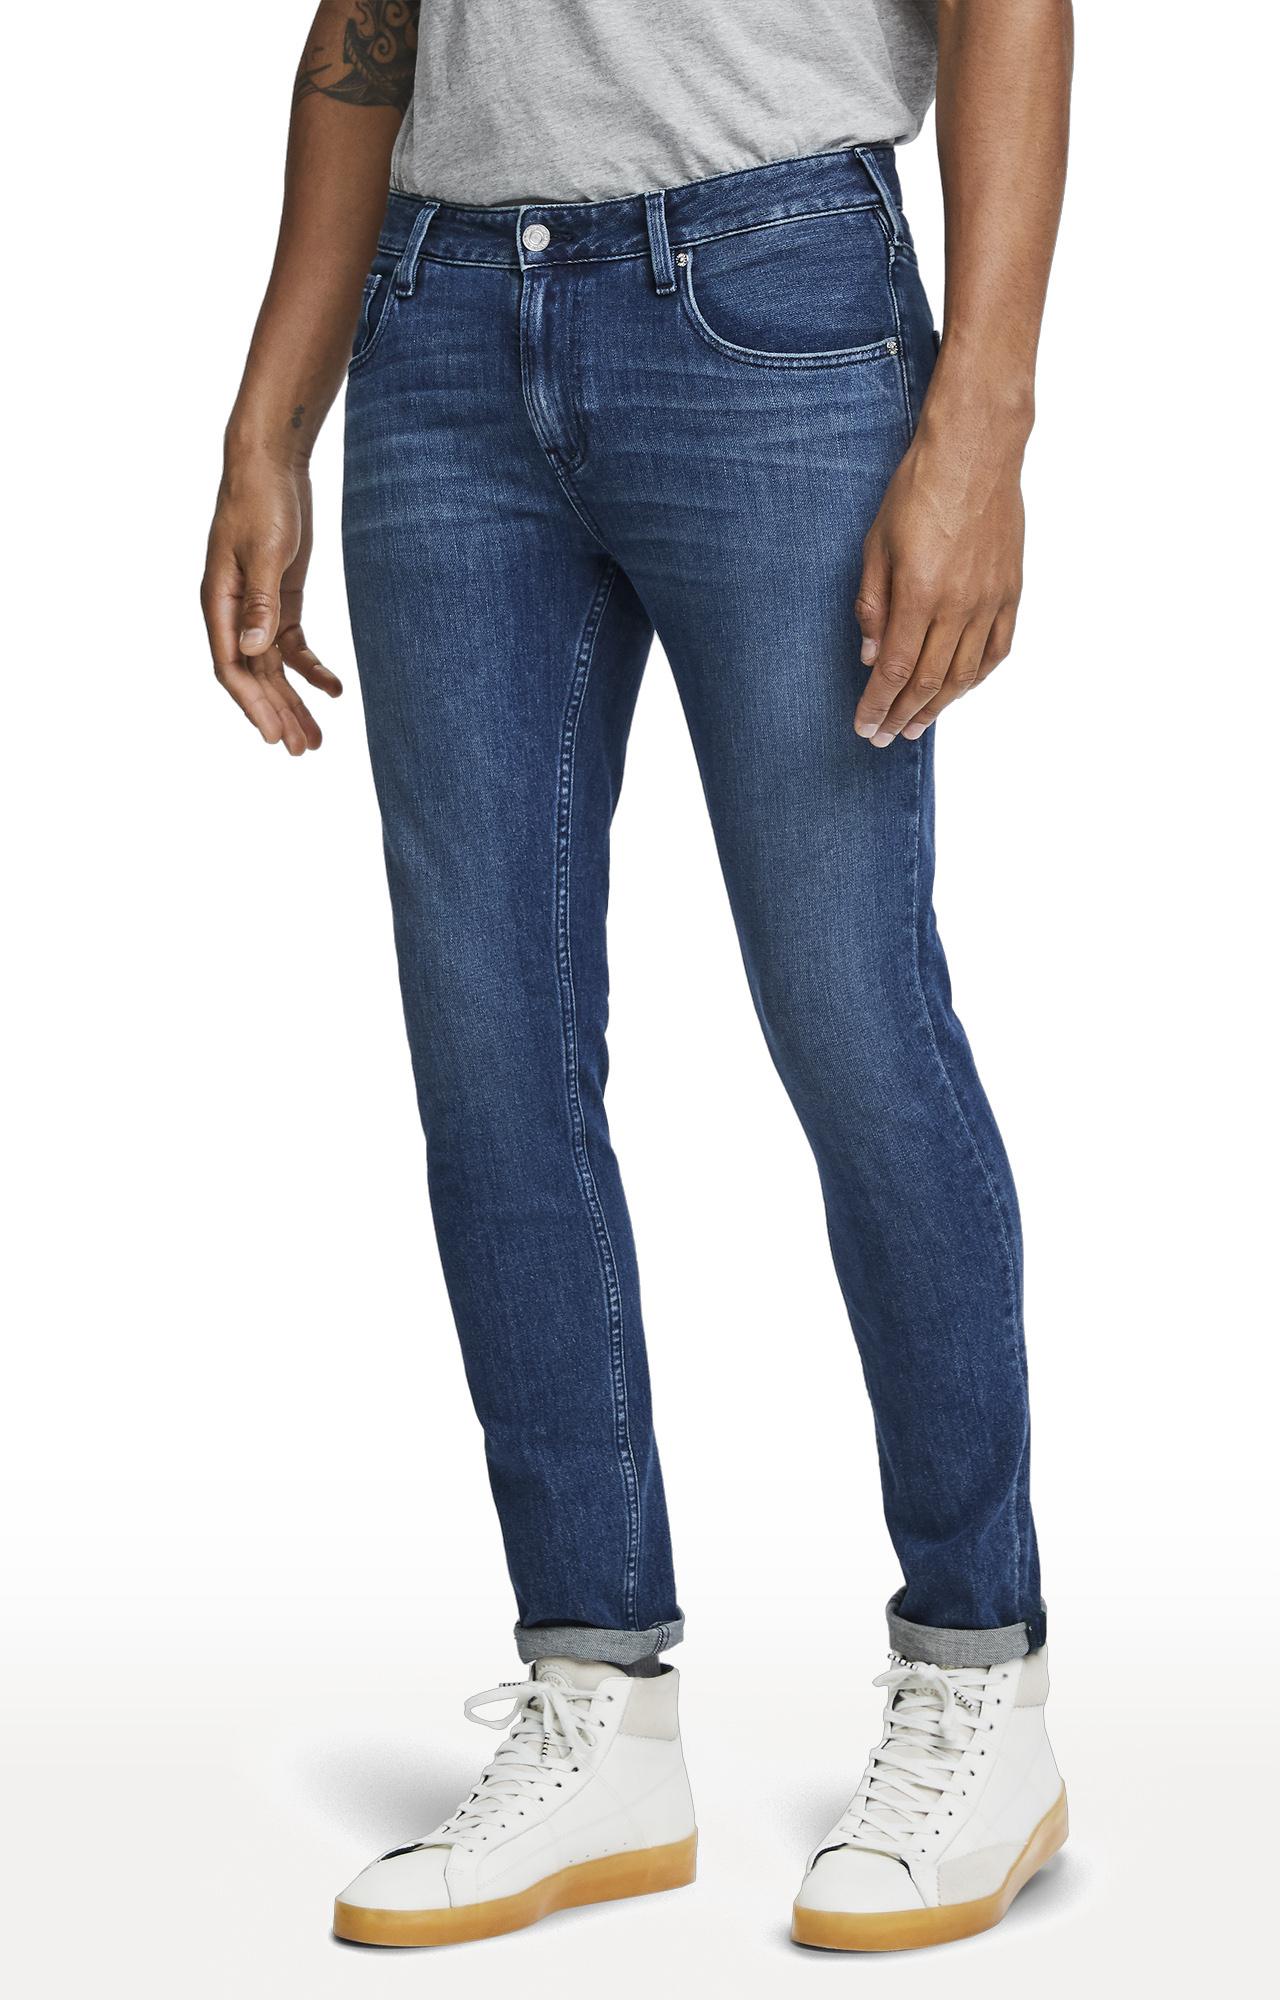 Scotch & Soda | Ink Wash Solid Skim Jeans